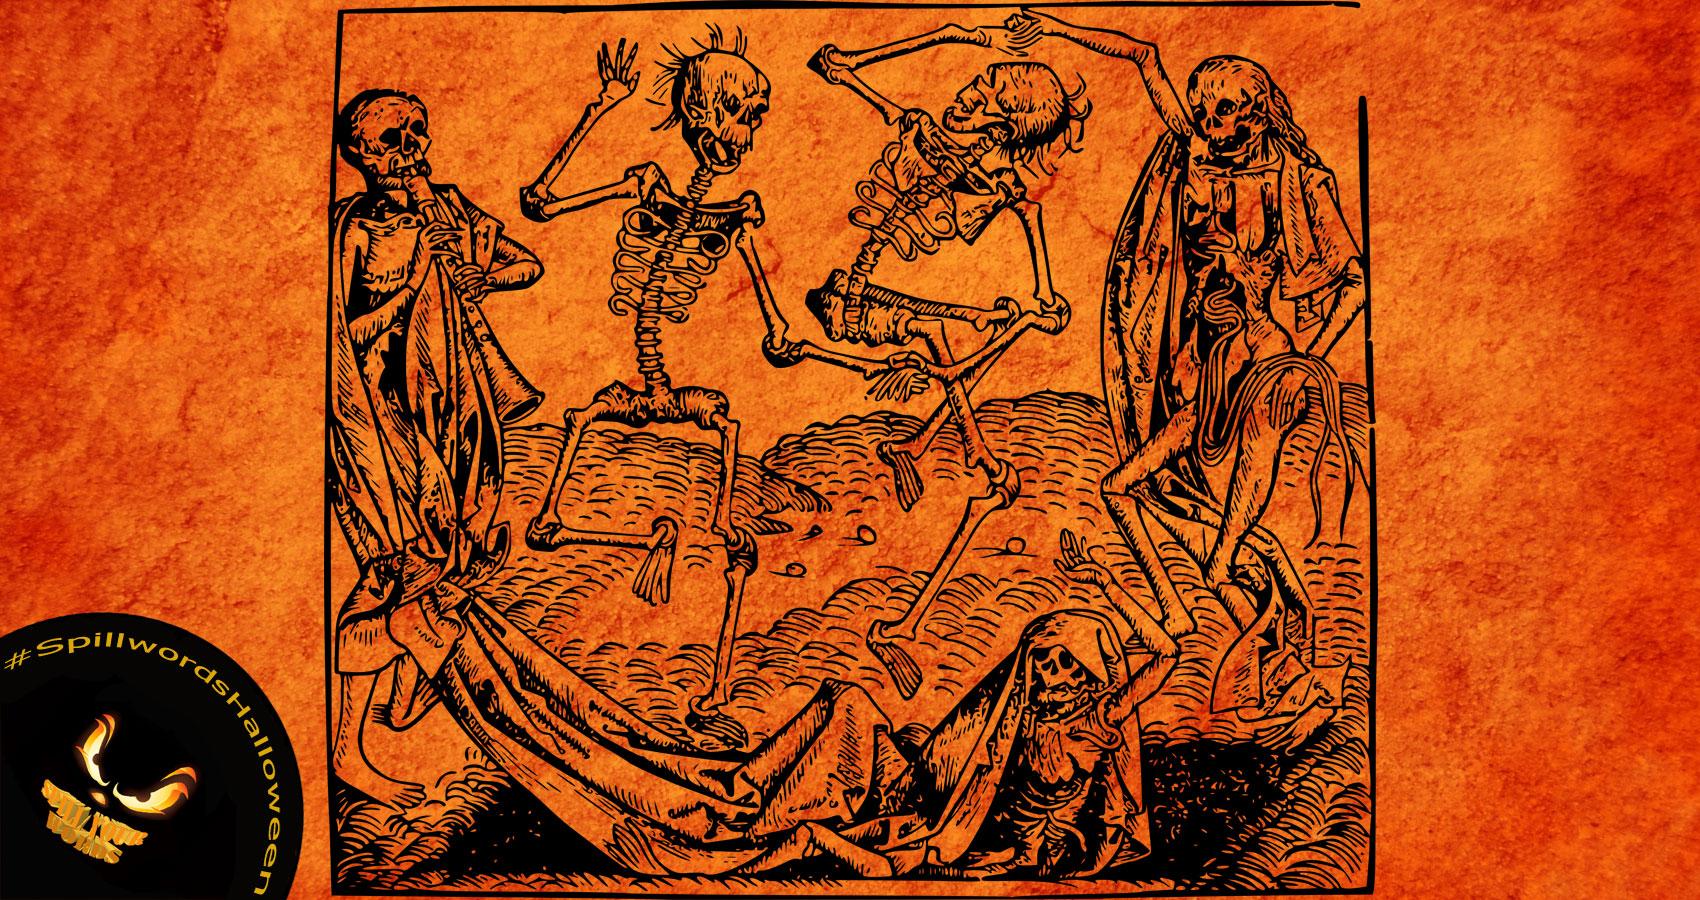 Dance Macabre, a haiku by Leta Hawk at Spillwords.com